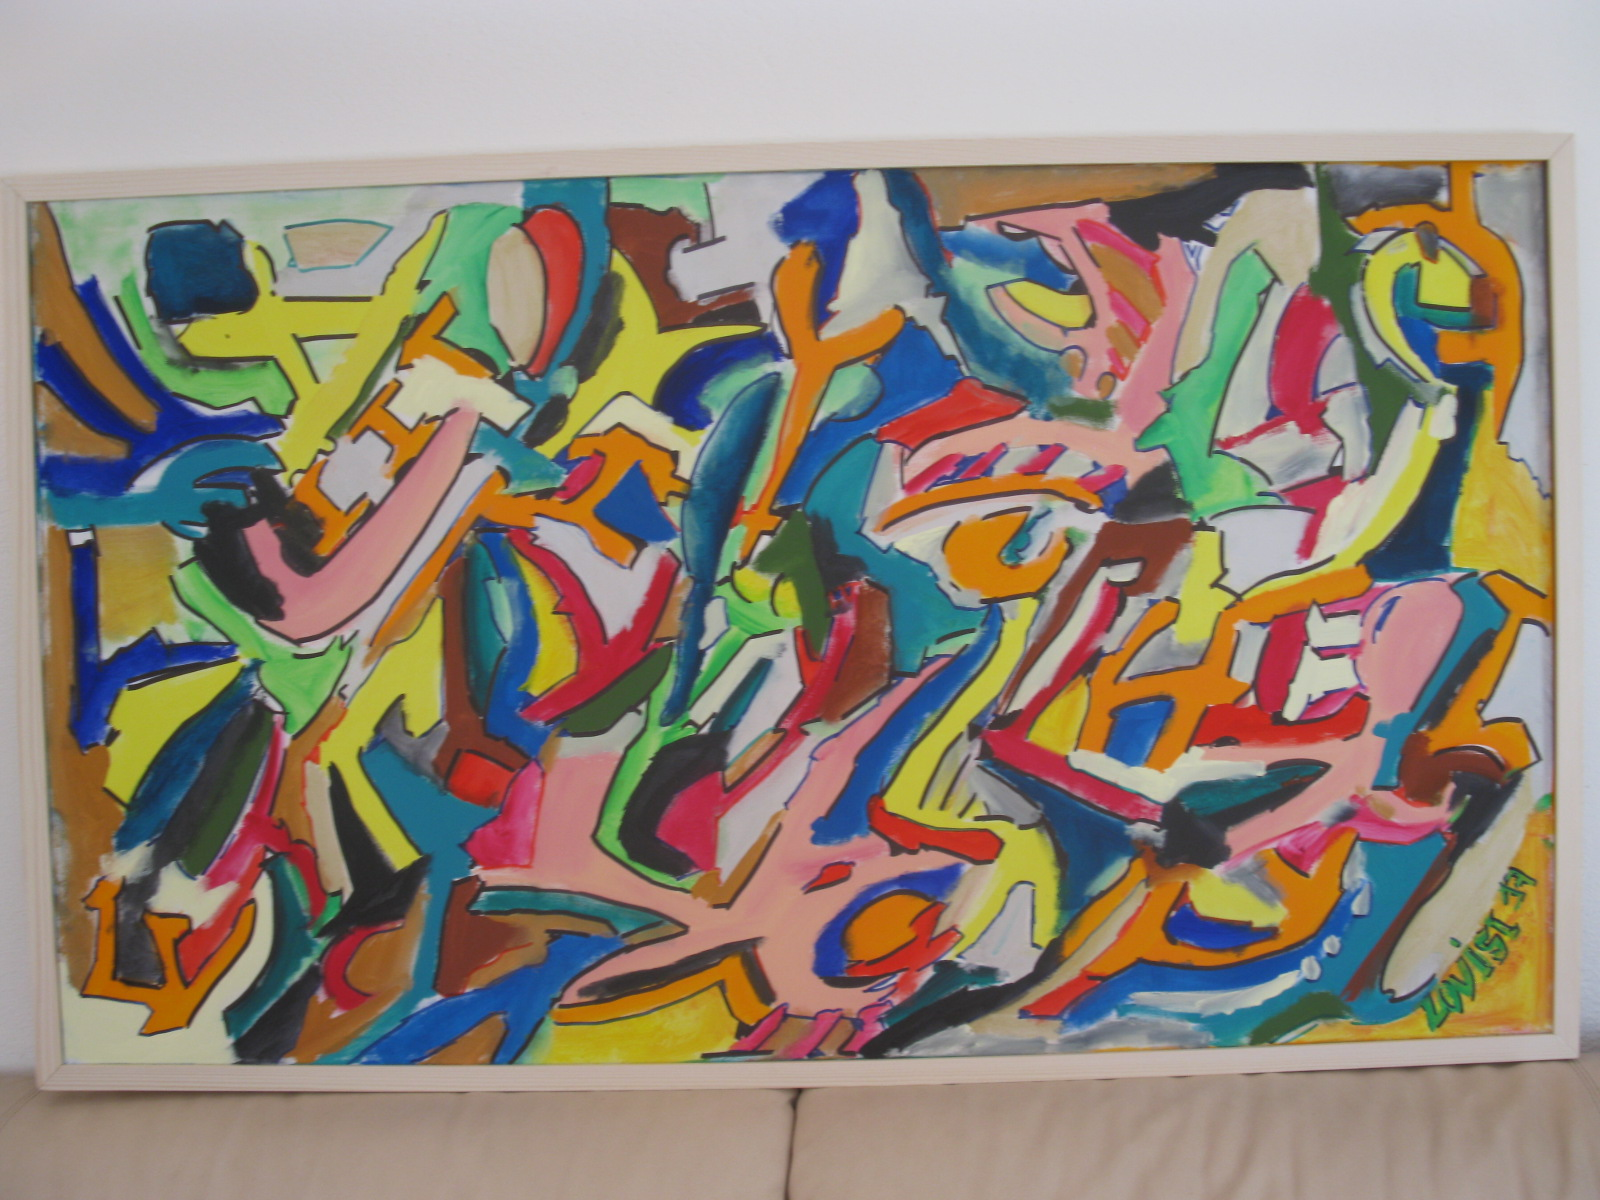 Comprare quadri buy original paintings comprare arte for Quadri arte contemporanea